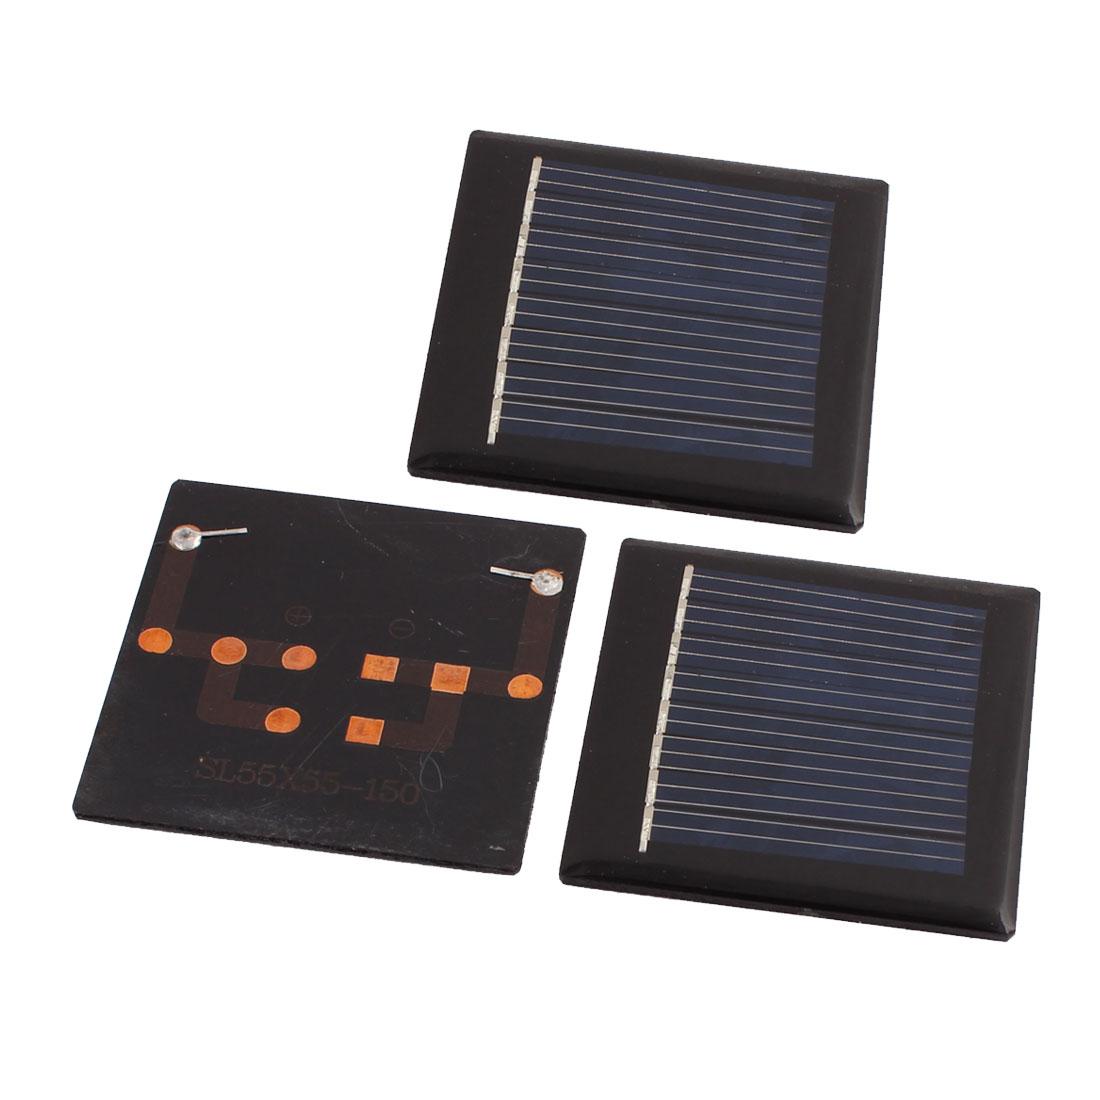 3Pcs 4V 40mA Solar Cell Panel Module Charging Board 55mm x 55mm